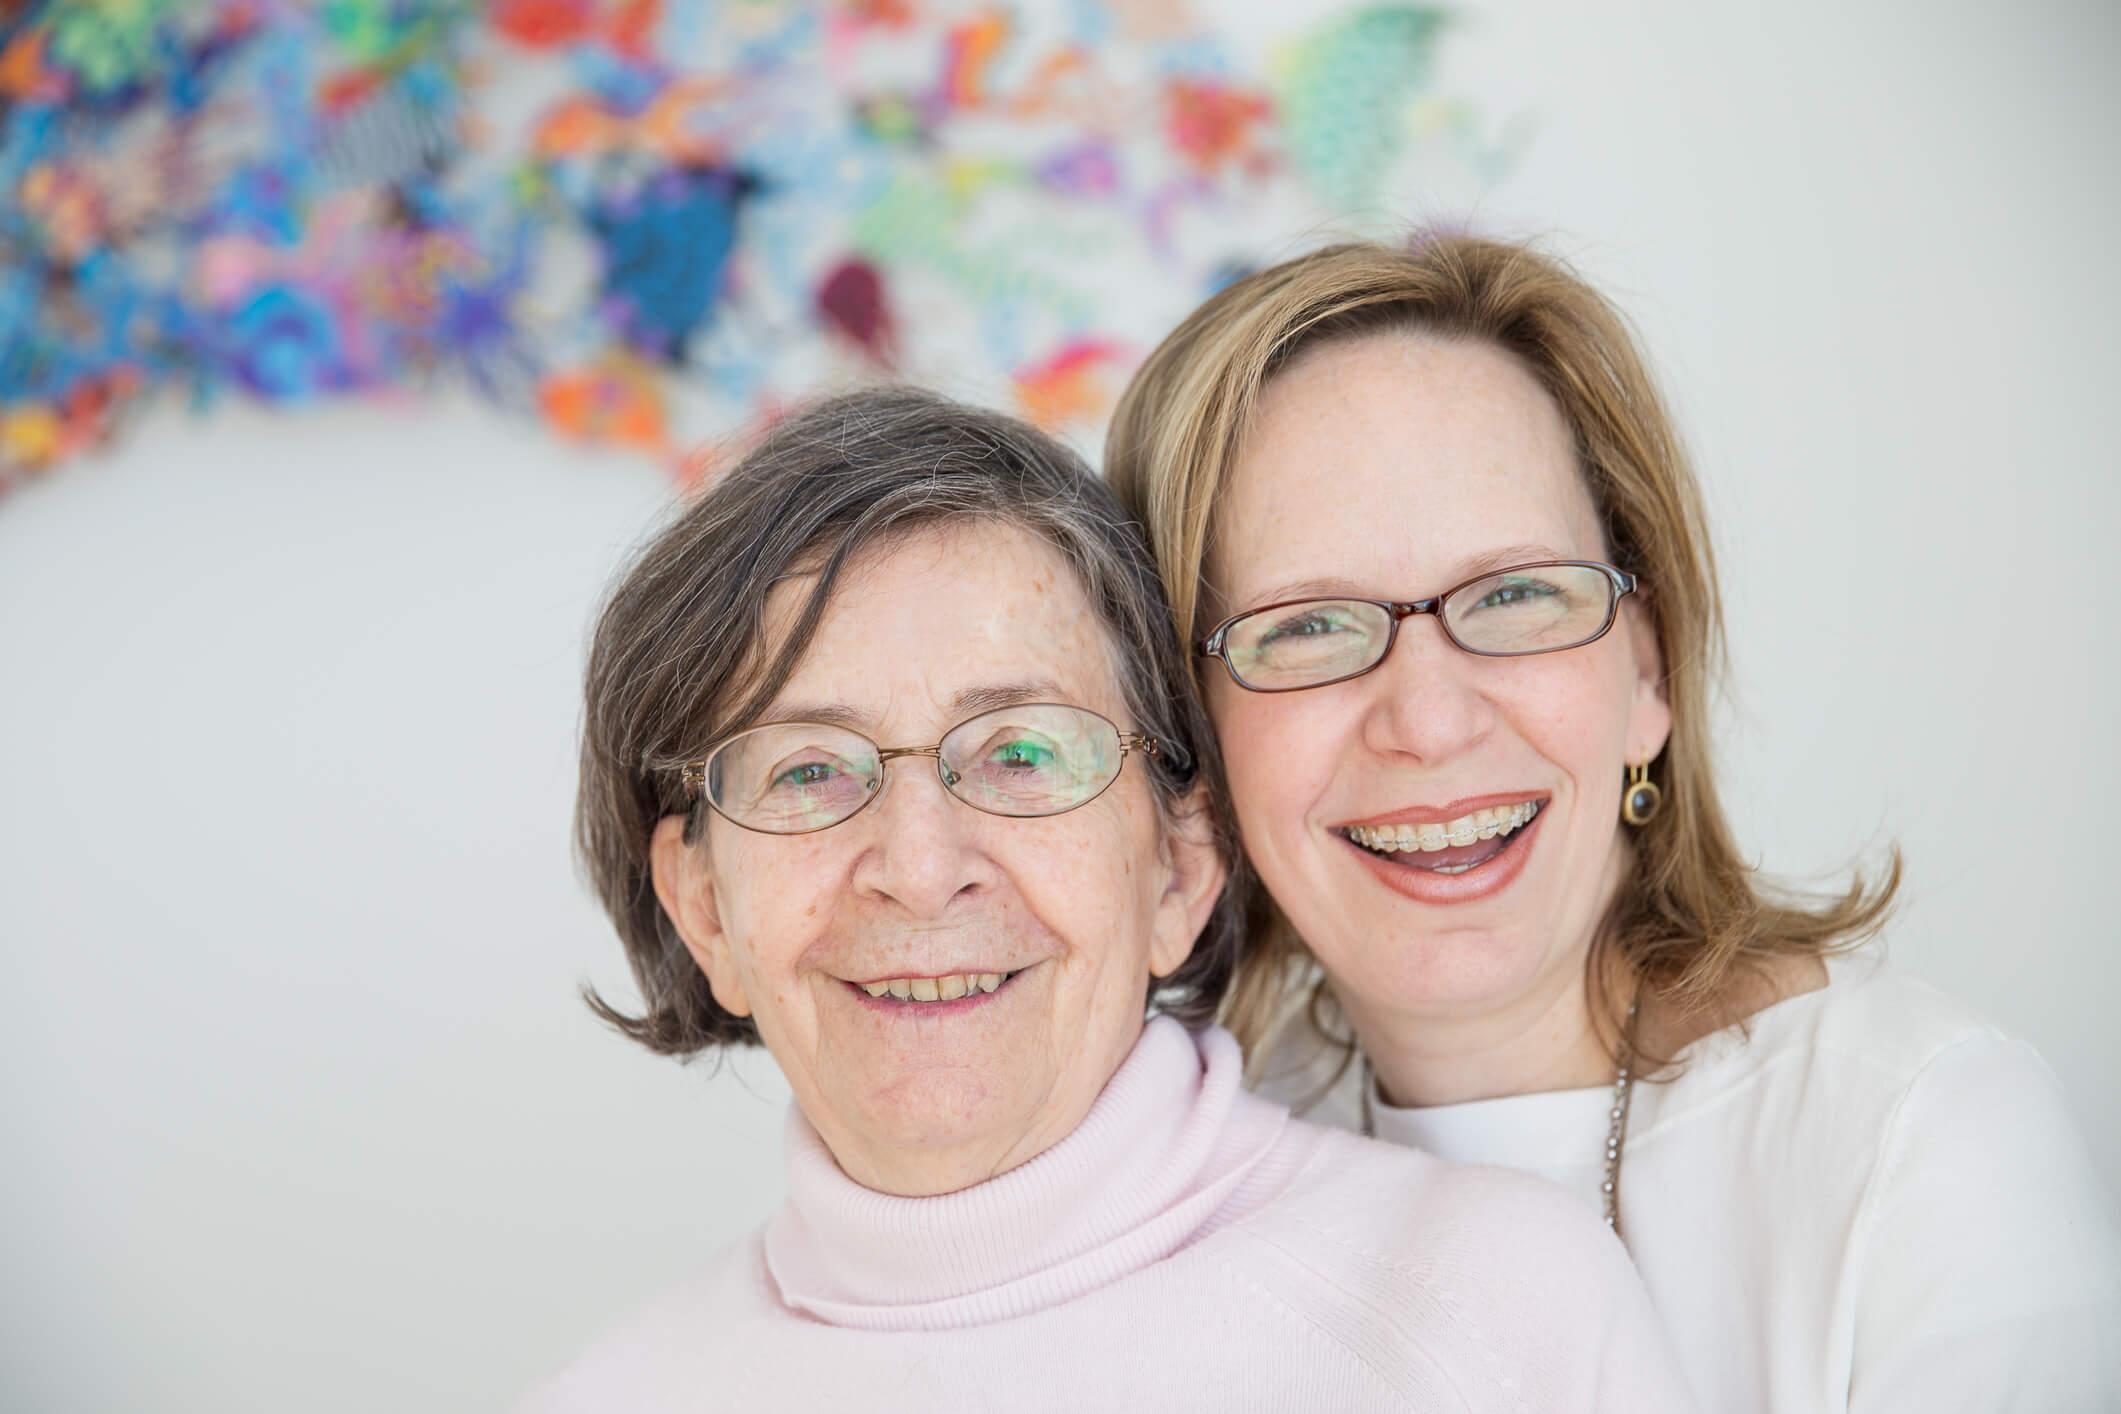 Family Photography - Fine Art Portraits, Boston-20